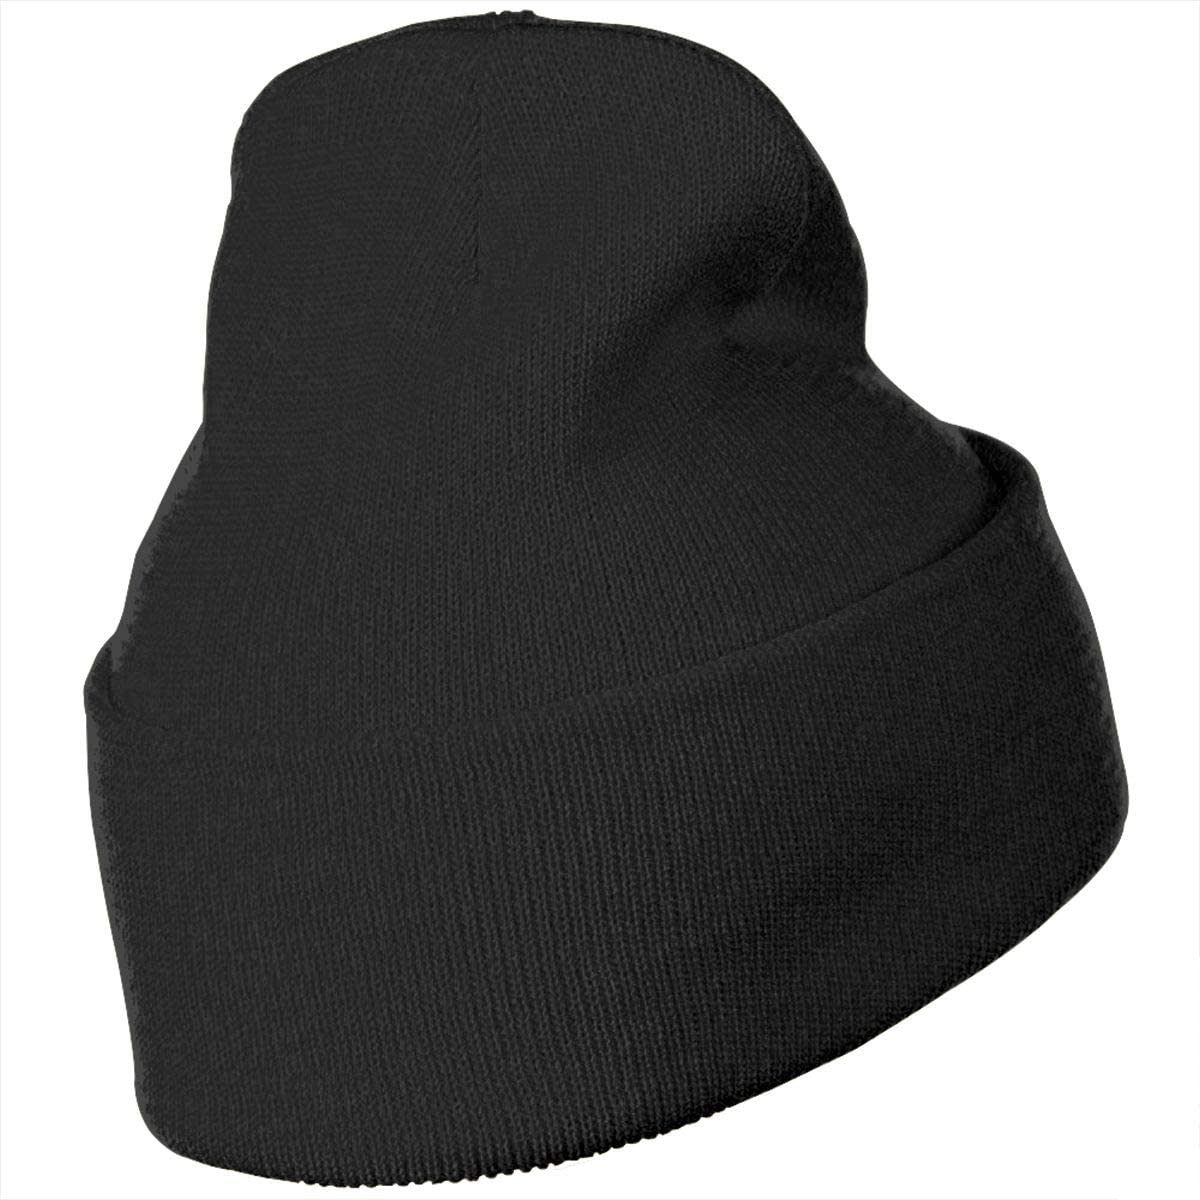 Yubb7E Lazy Eggs Warm Knit Winter Solid Beanie Hat Unisex Skull Cap